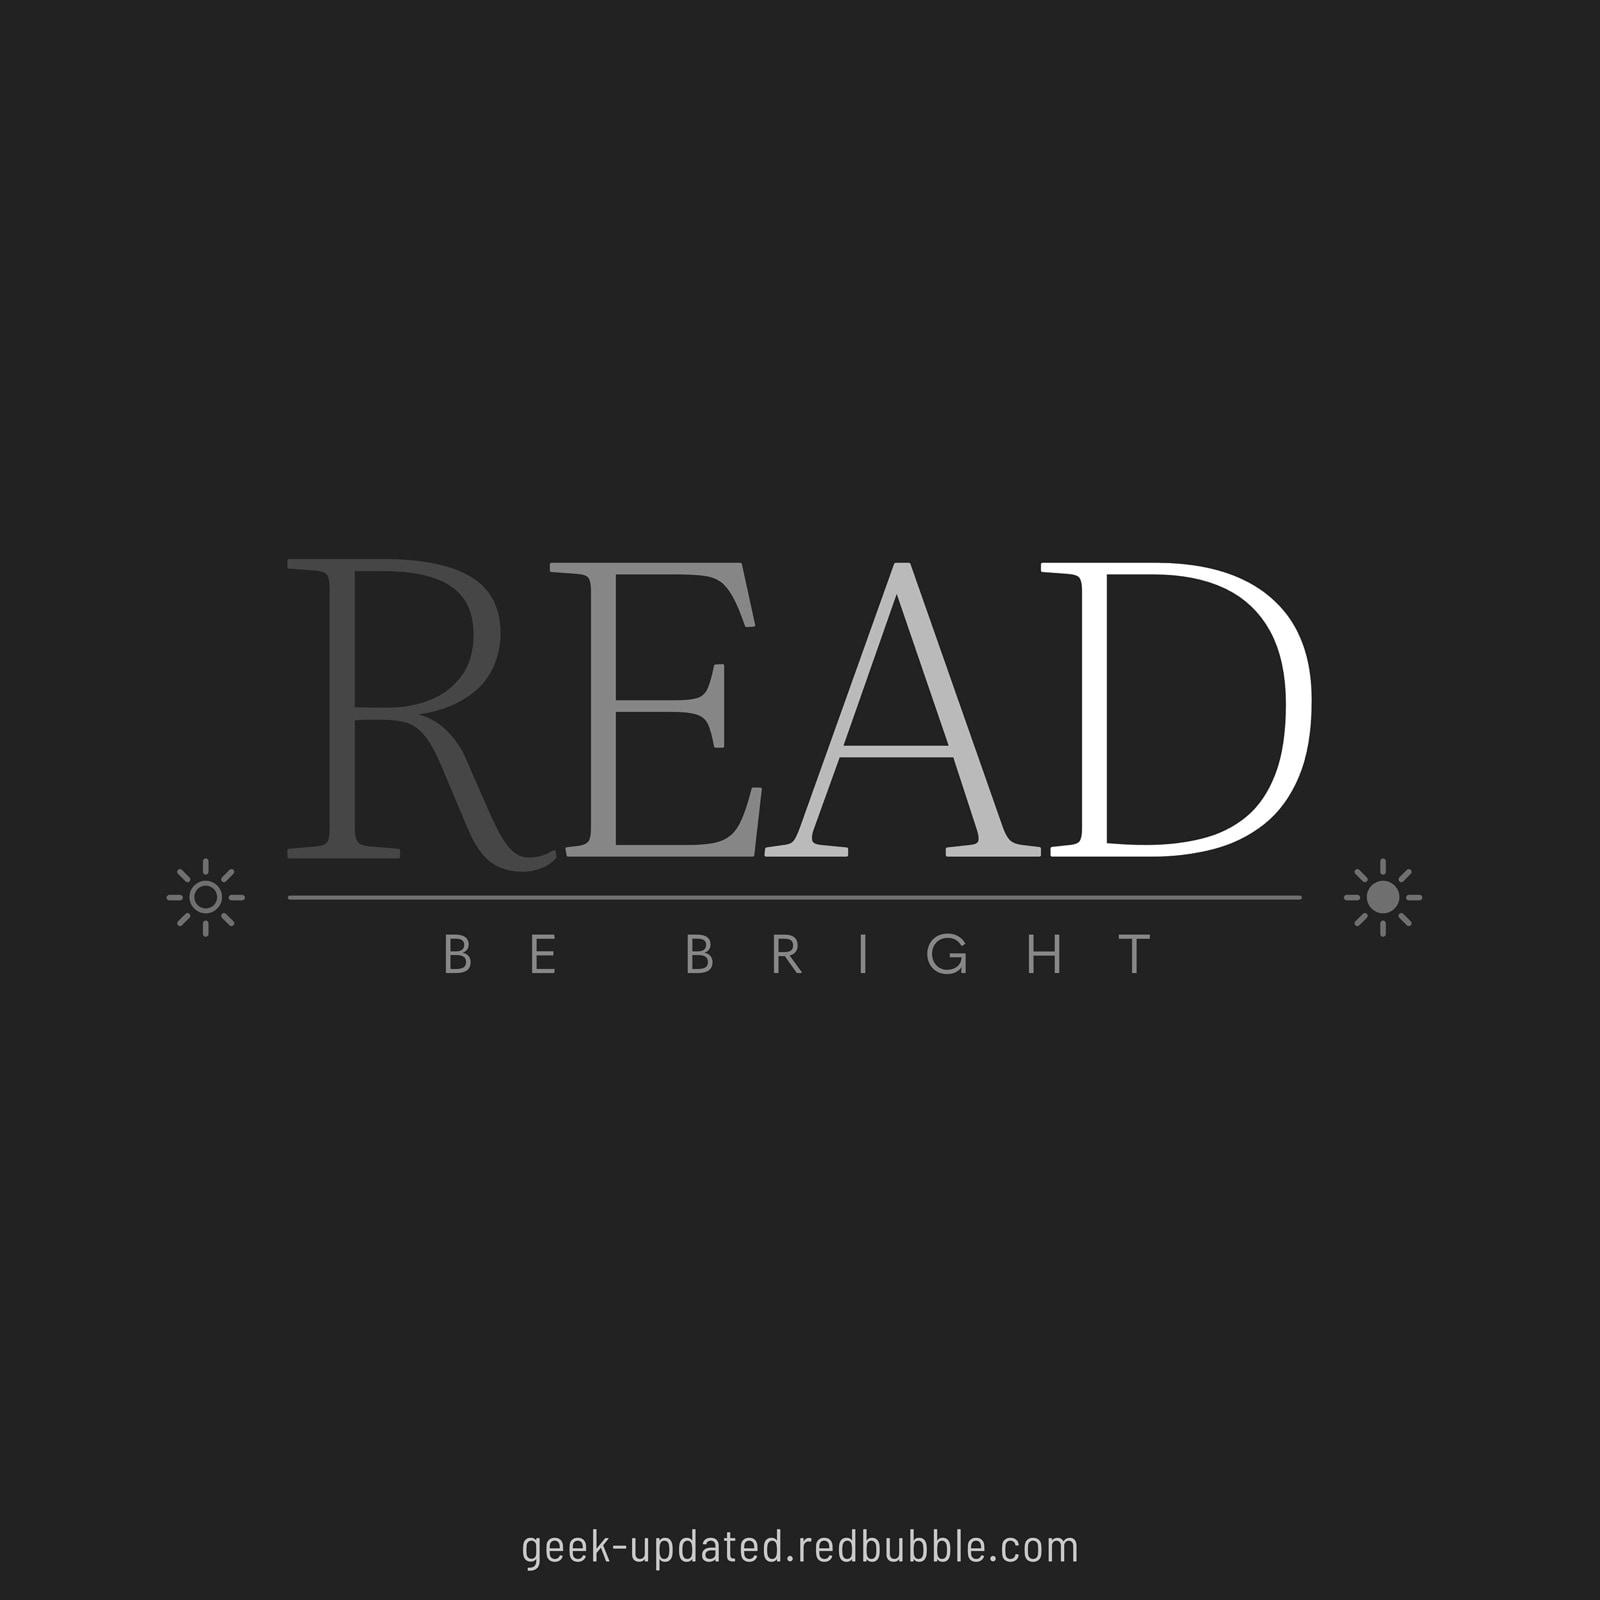 Read books be brighter - design by Piotr Kowalczyk